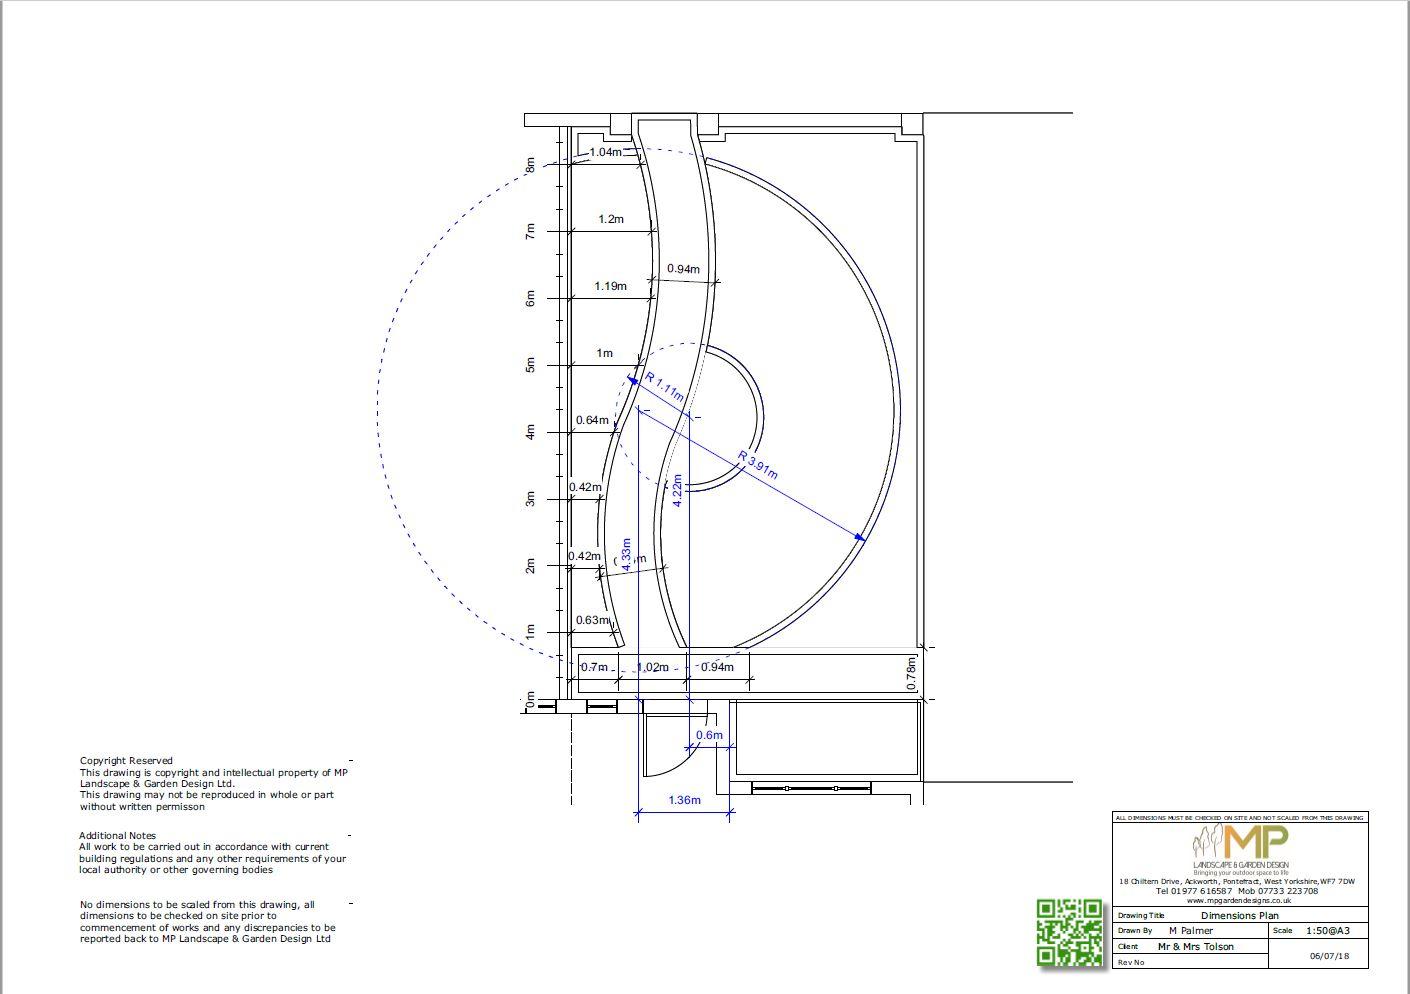 Garden layout dimensions plans for a front garden in Kippax, Leeds